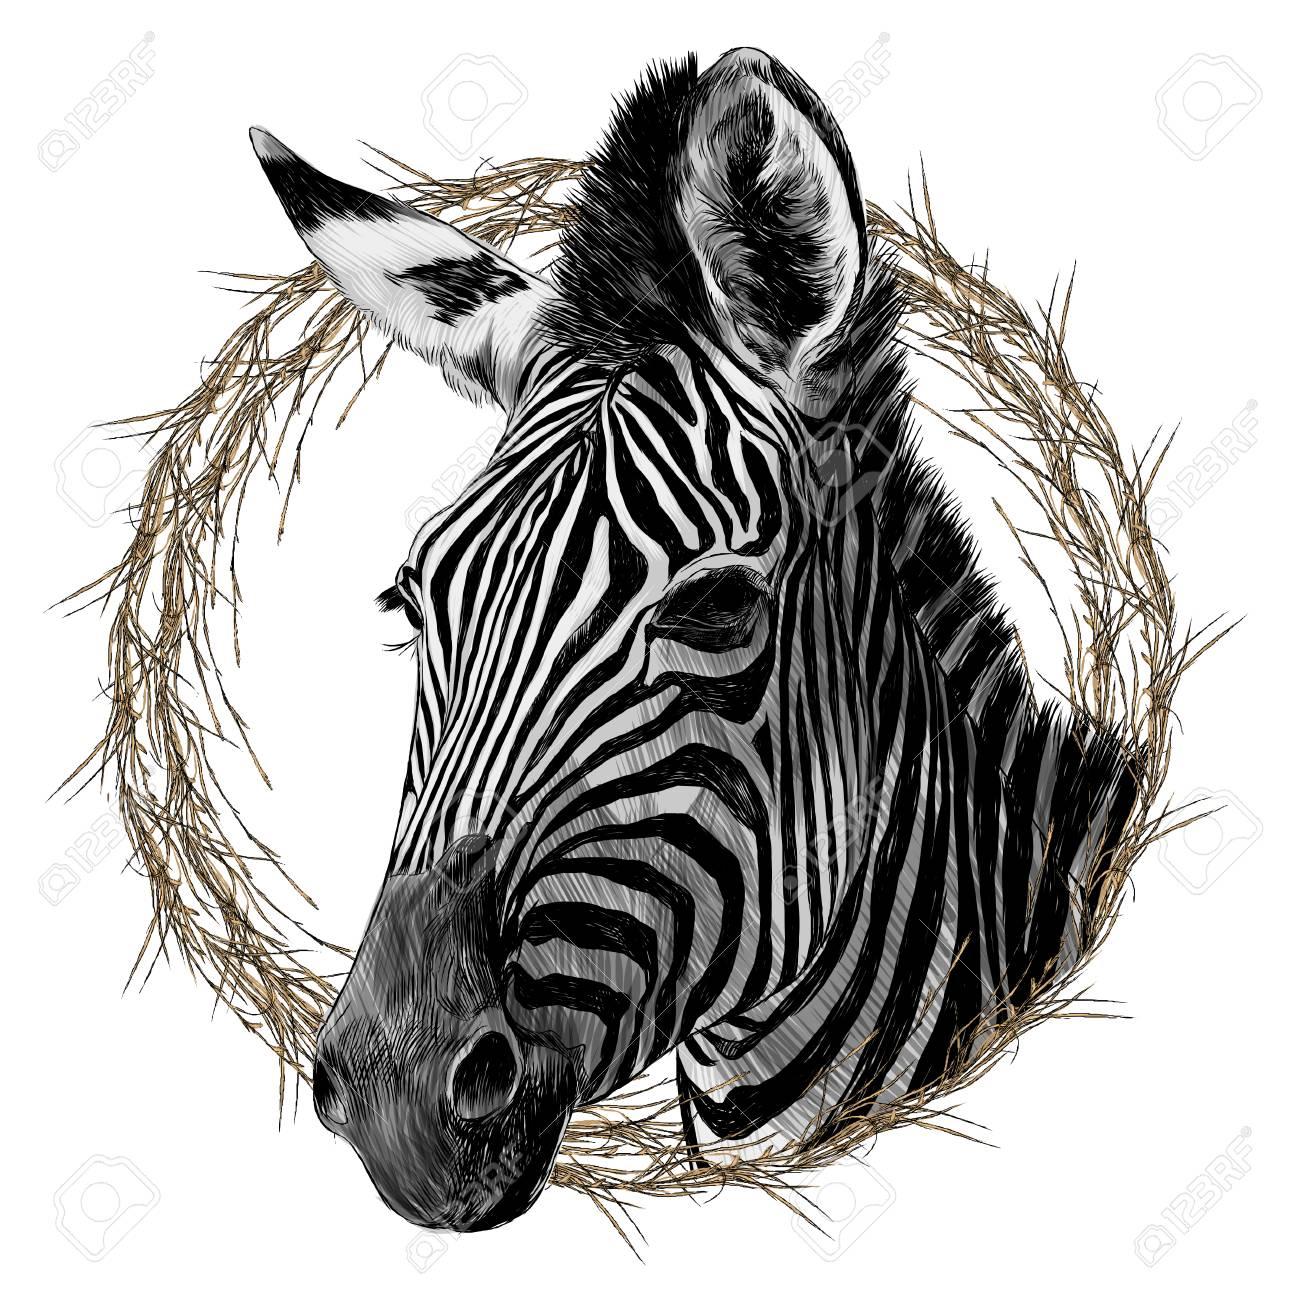 Zebra Head Framed Sketch Graphic Design. Royalty Free Cliparts ...